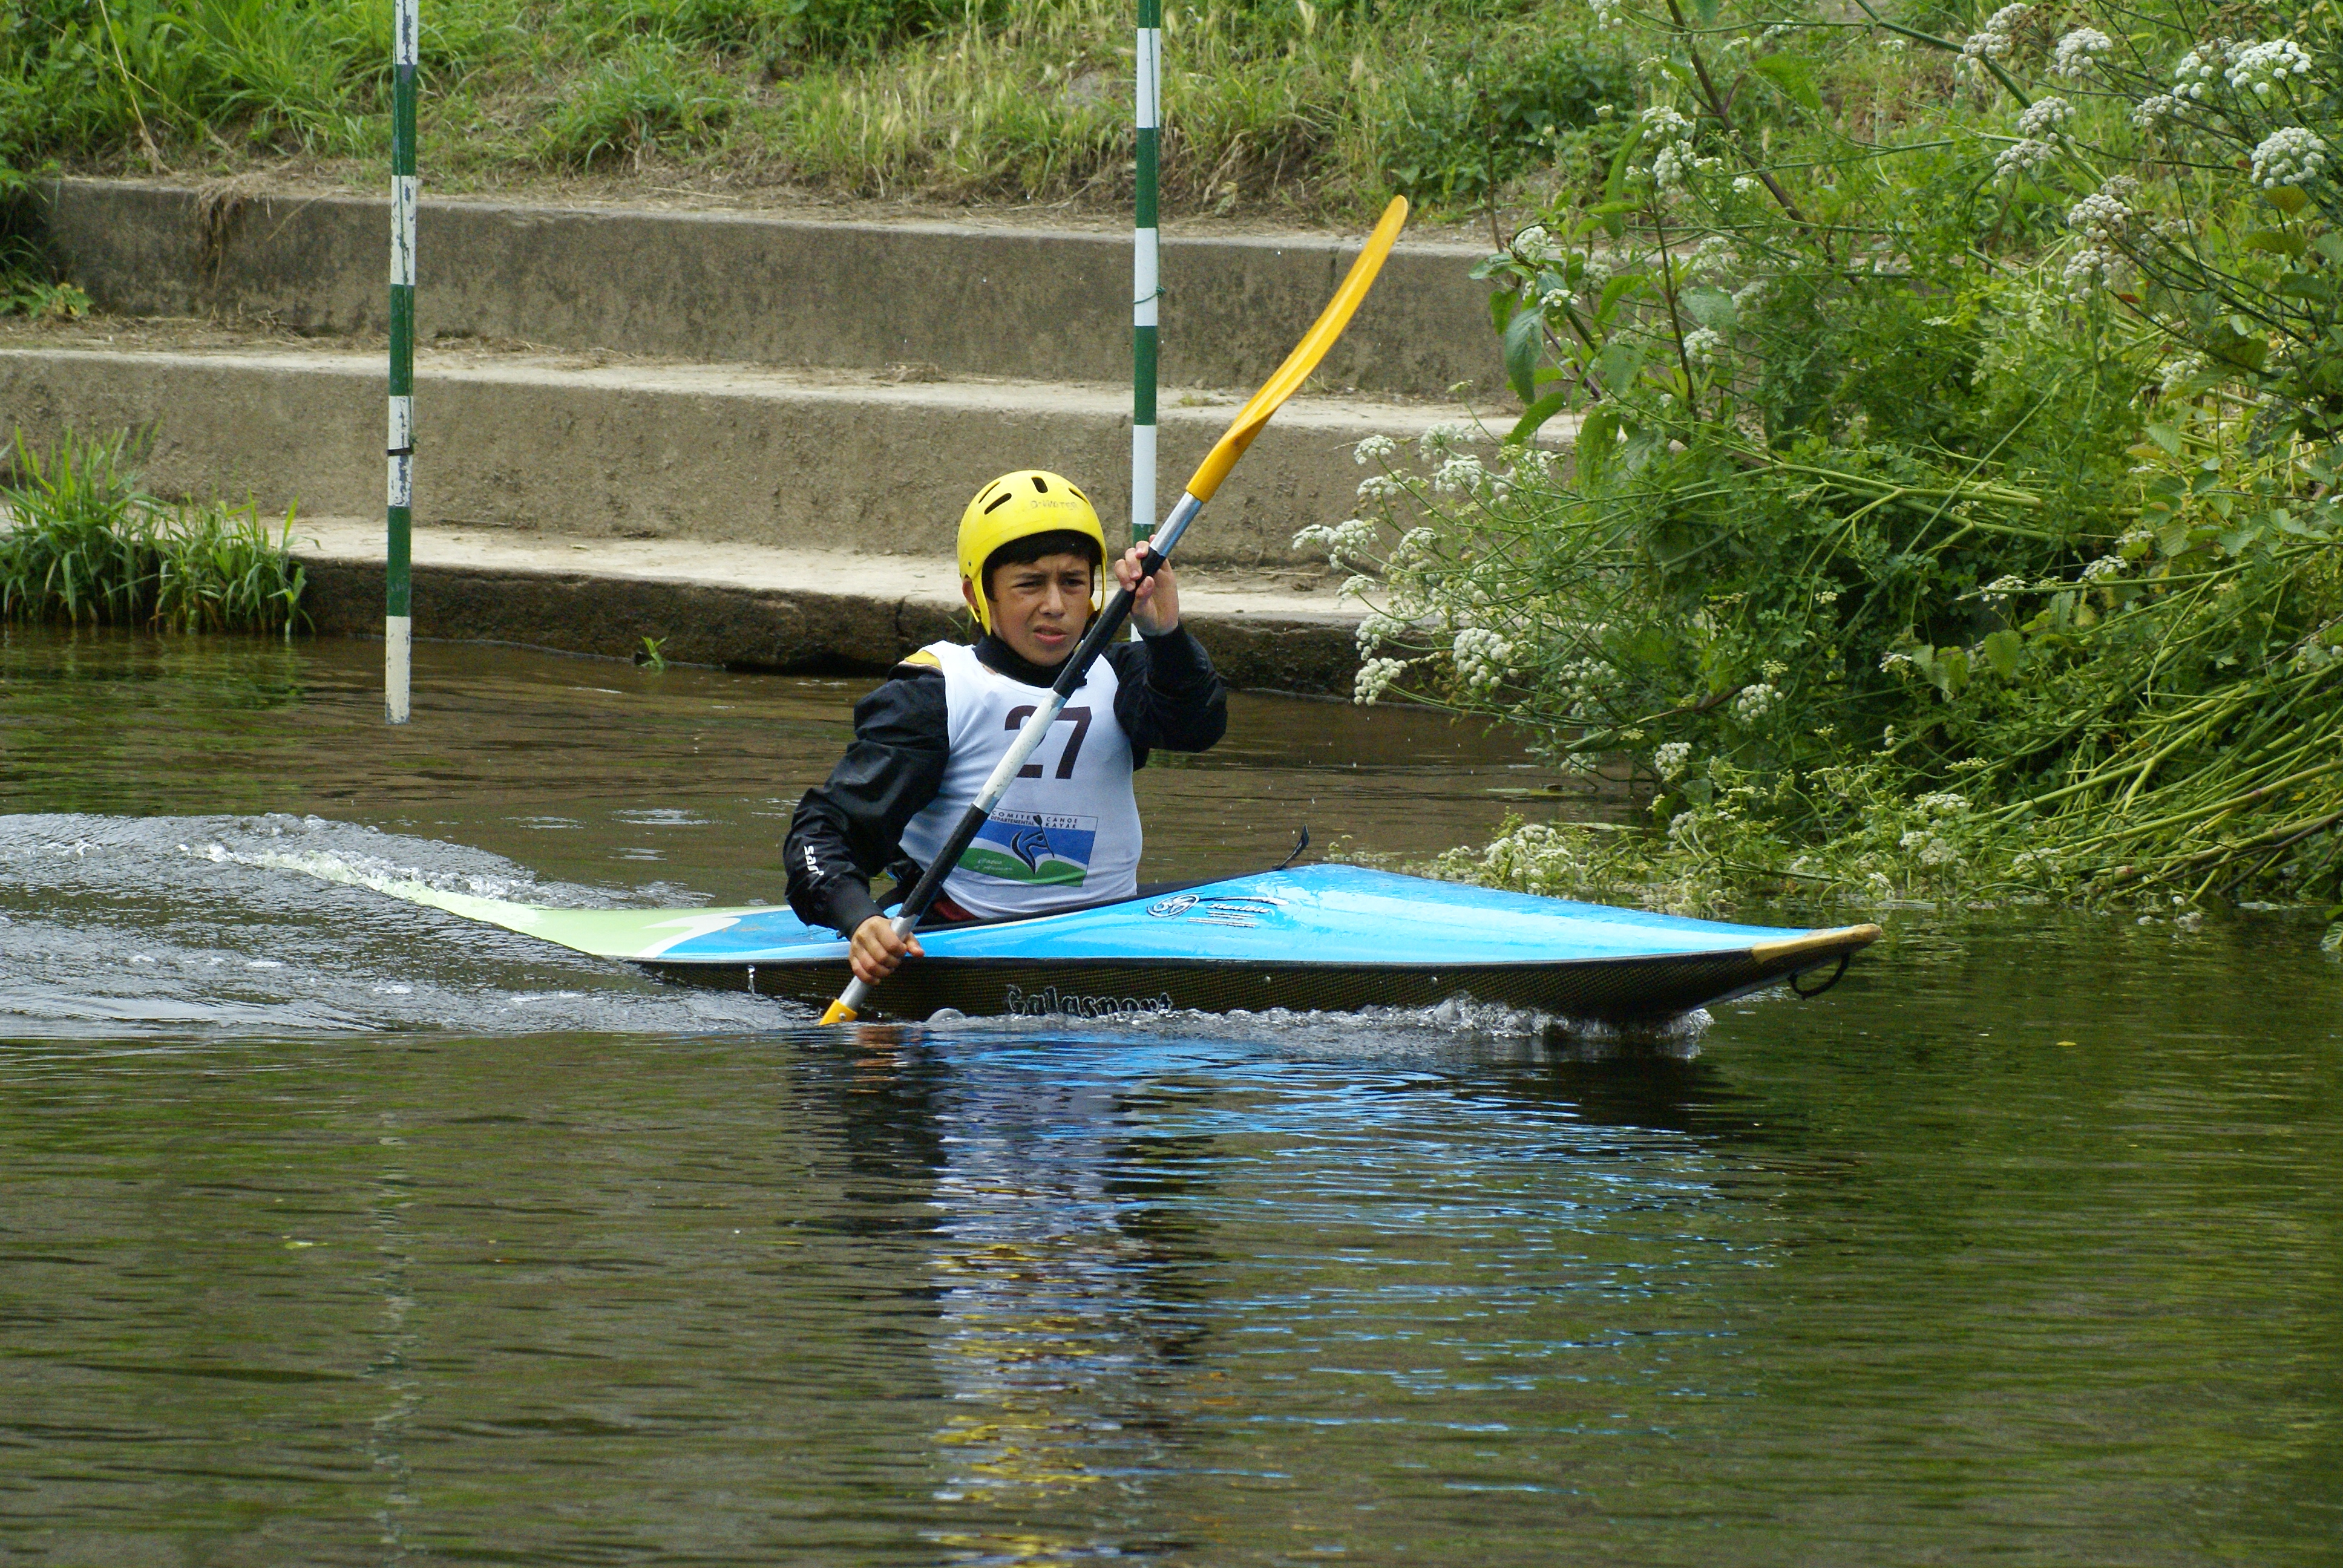 Yassine en slalom